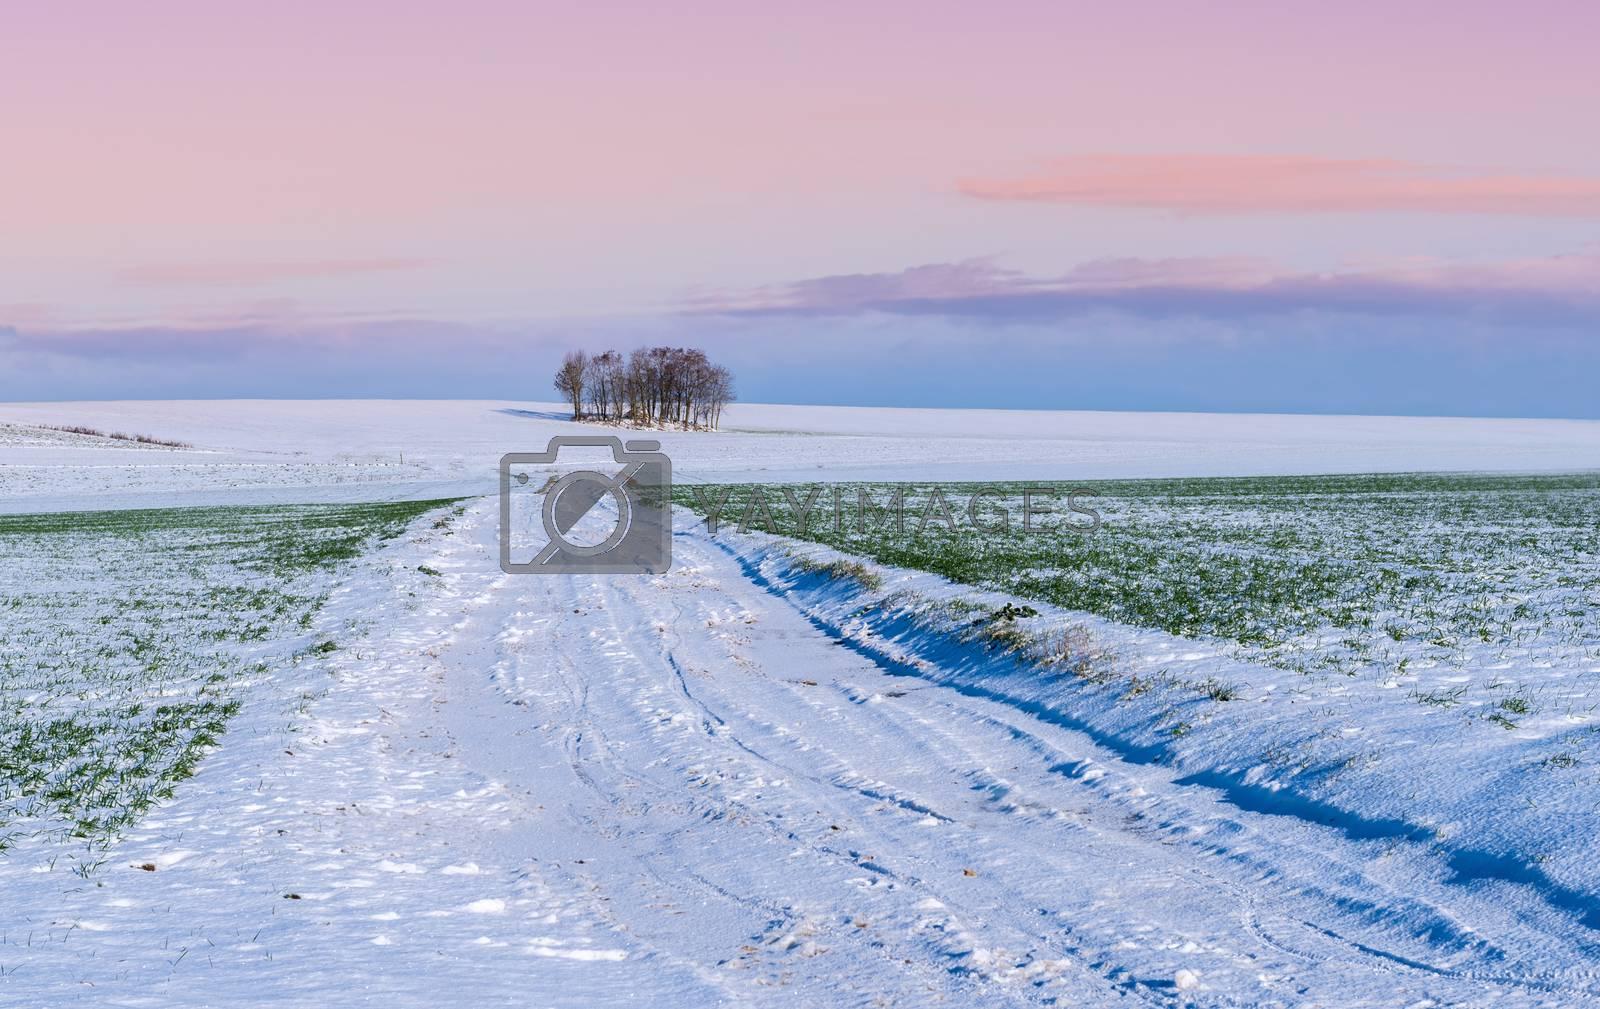 snowy countryside by gufoto